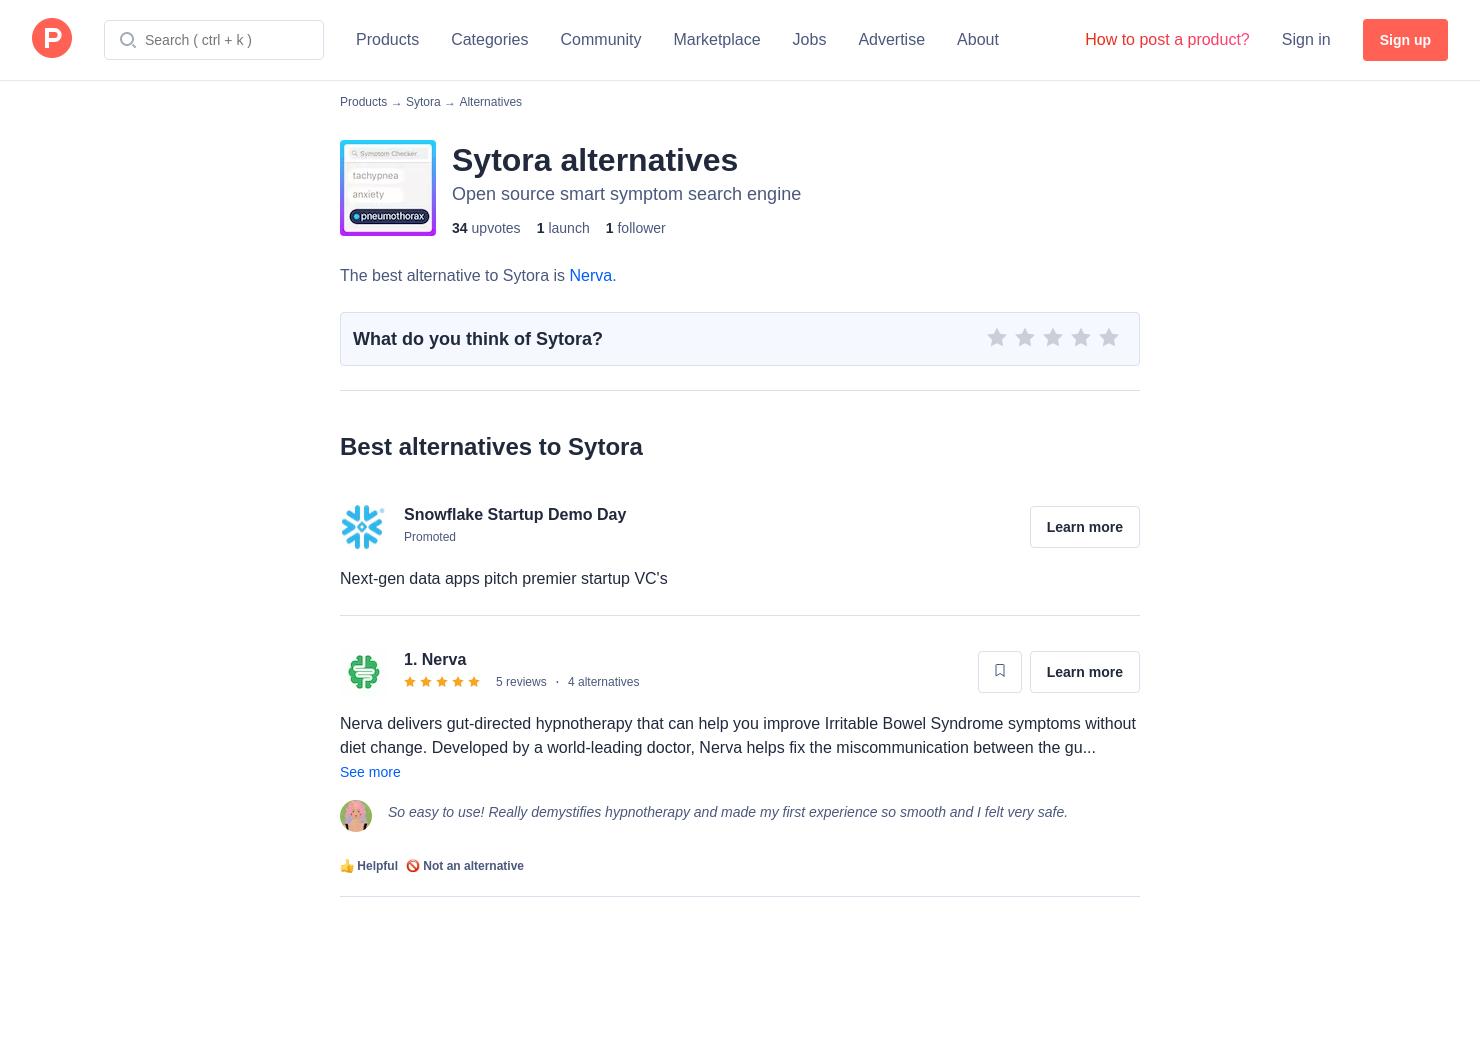 7 Alternatives to Sytora | Product Hunt